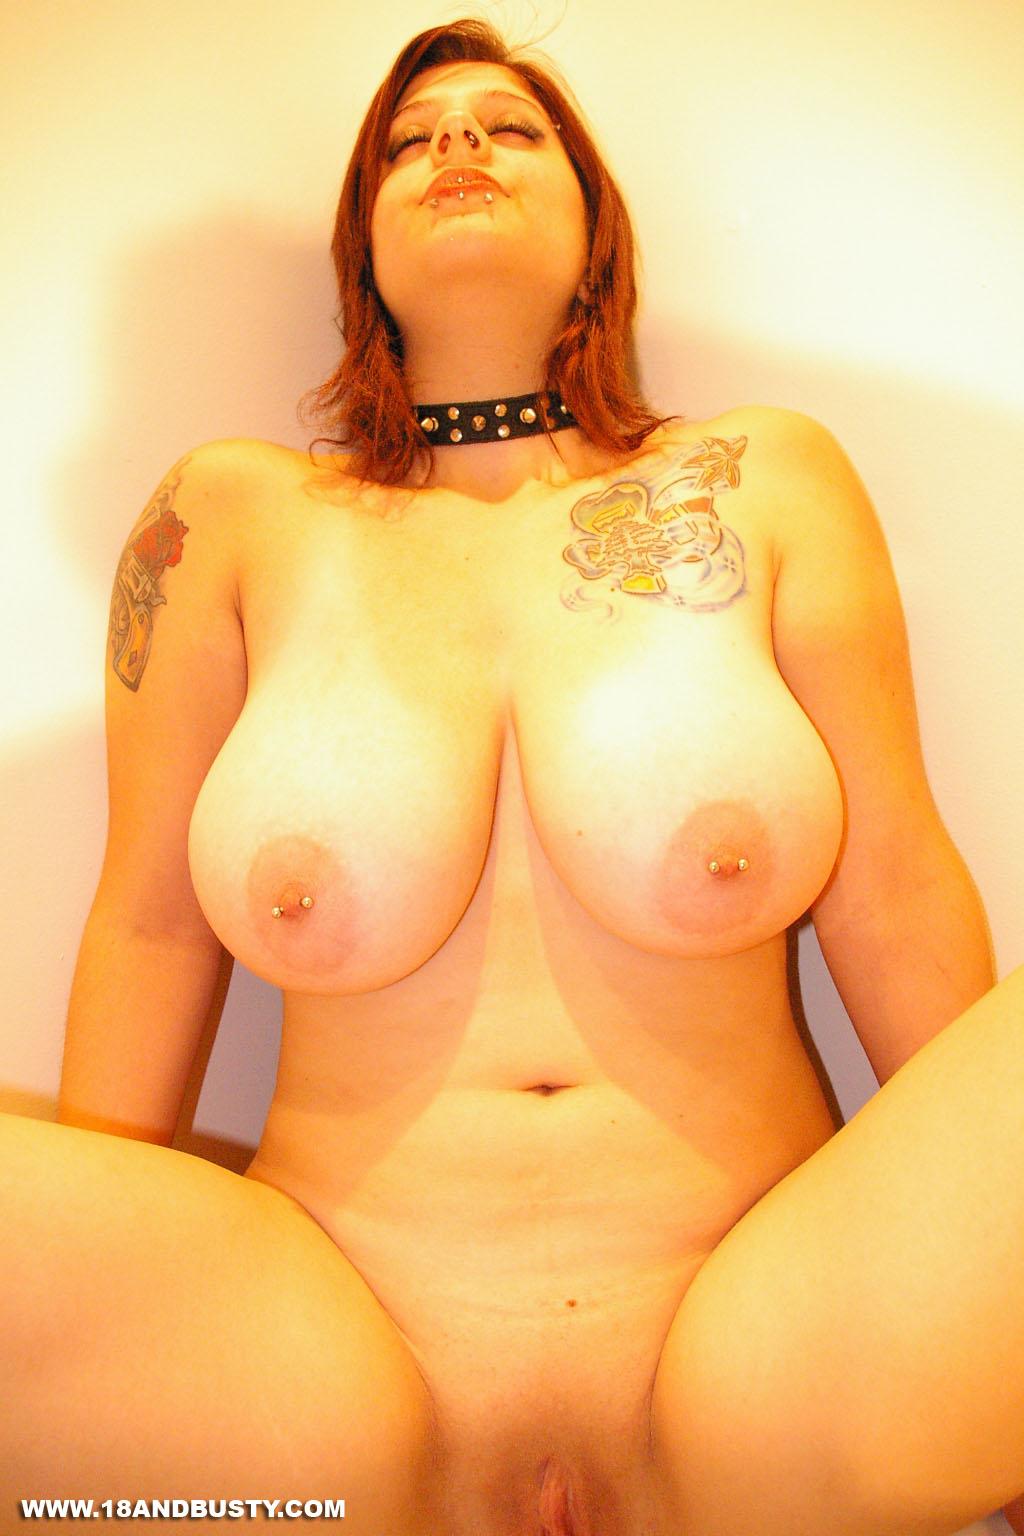 Busty gallery woman